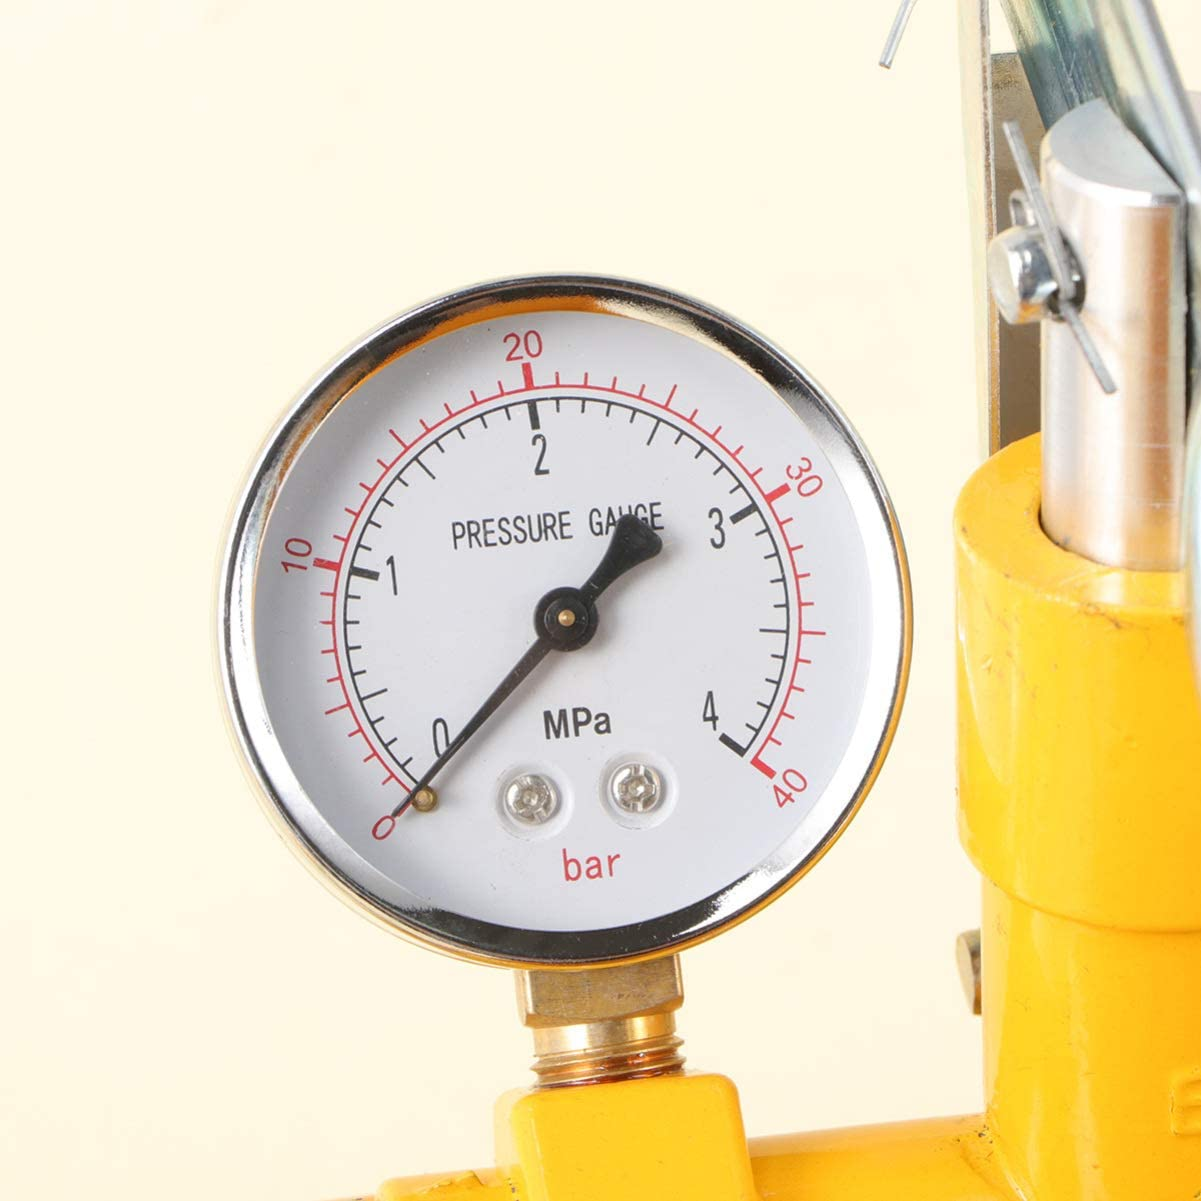 ULTECHNOVO Pressure Test Pump,Aluminum Hydrostatic Hand Pump Testing Tool Water Pressure Tester for Fire Sprinklers Irrigation Systems Pressure Vessels 40KG